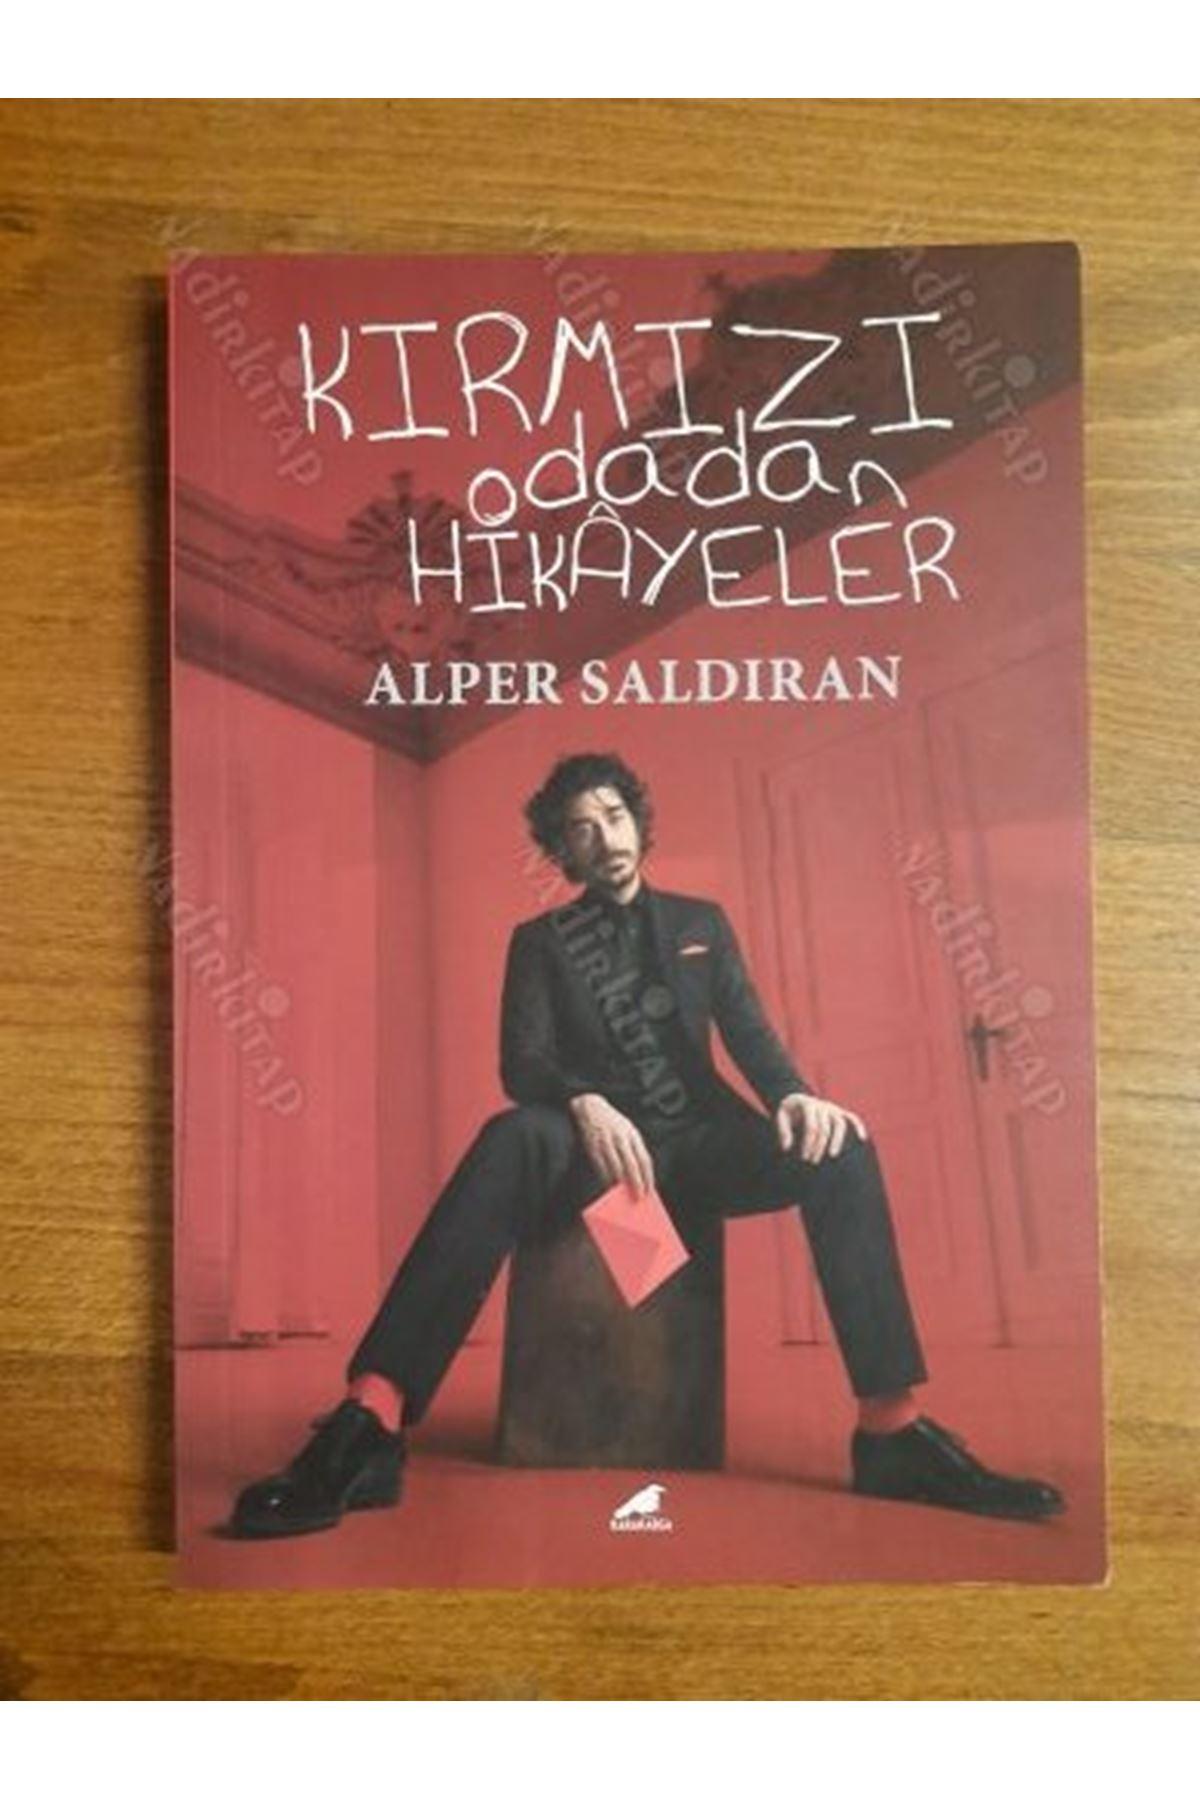 ALPER SALDIRAN - KIRMIZI ODADAN HİKAYELER